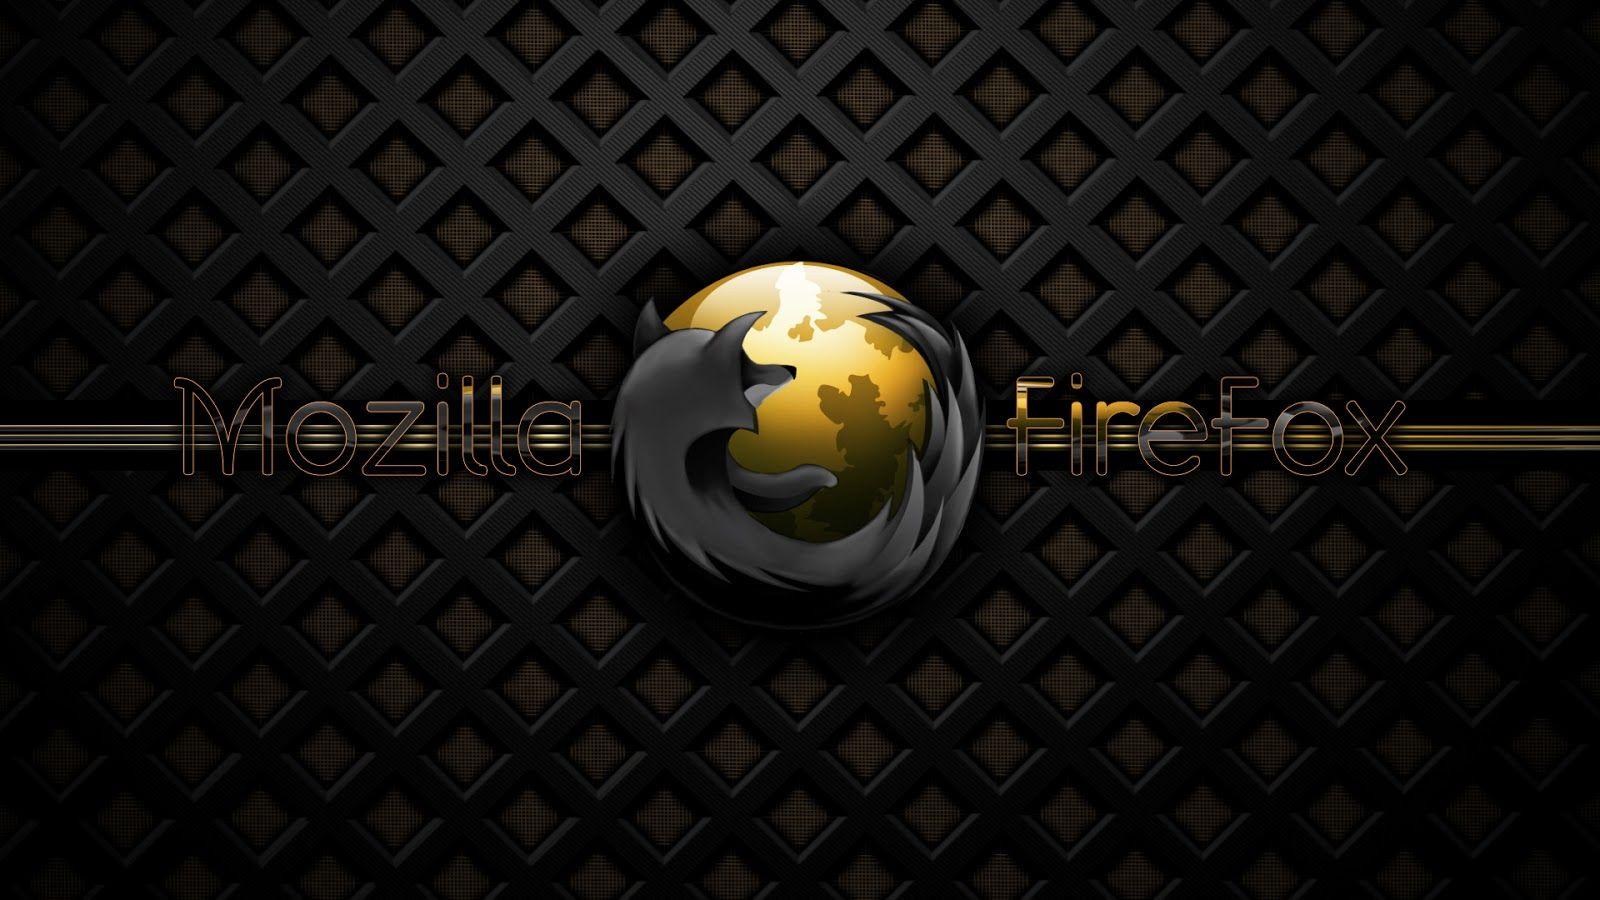 firefox wallpaper 4k